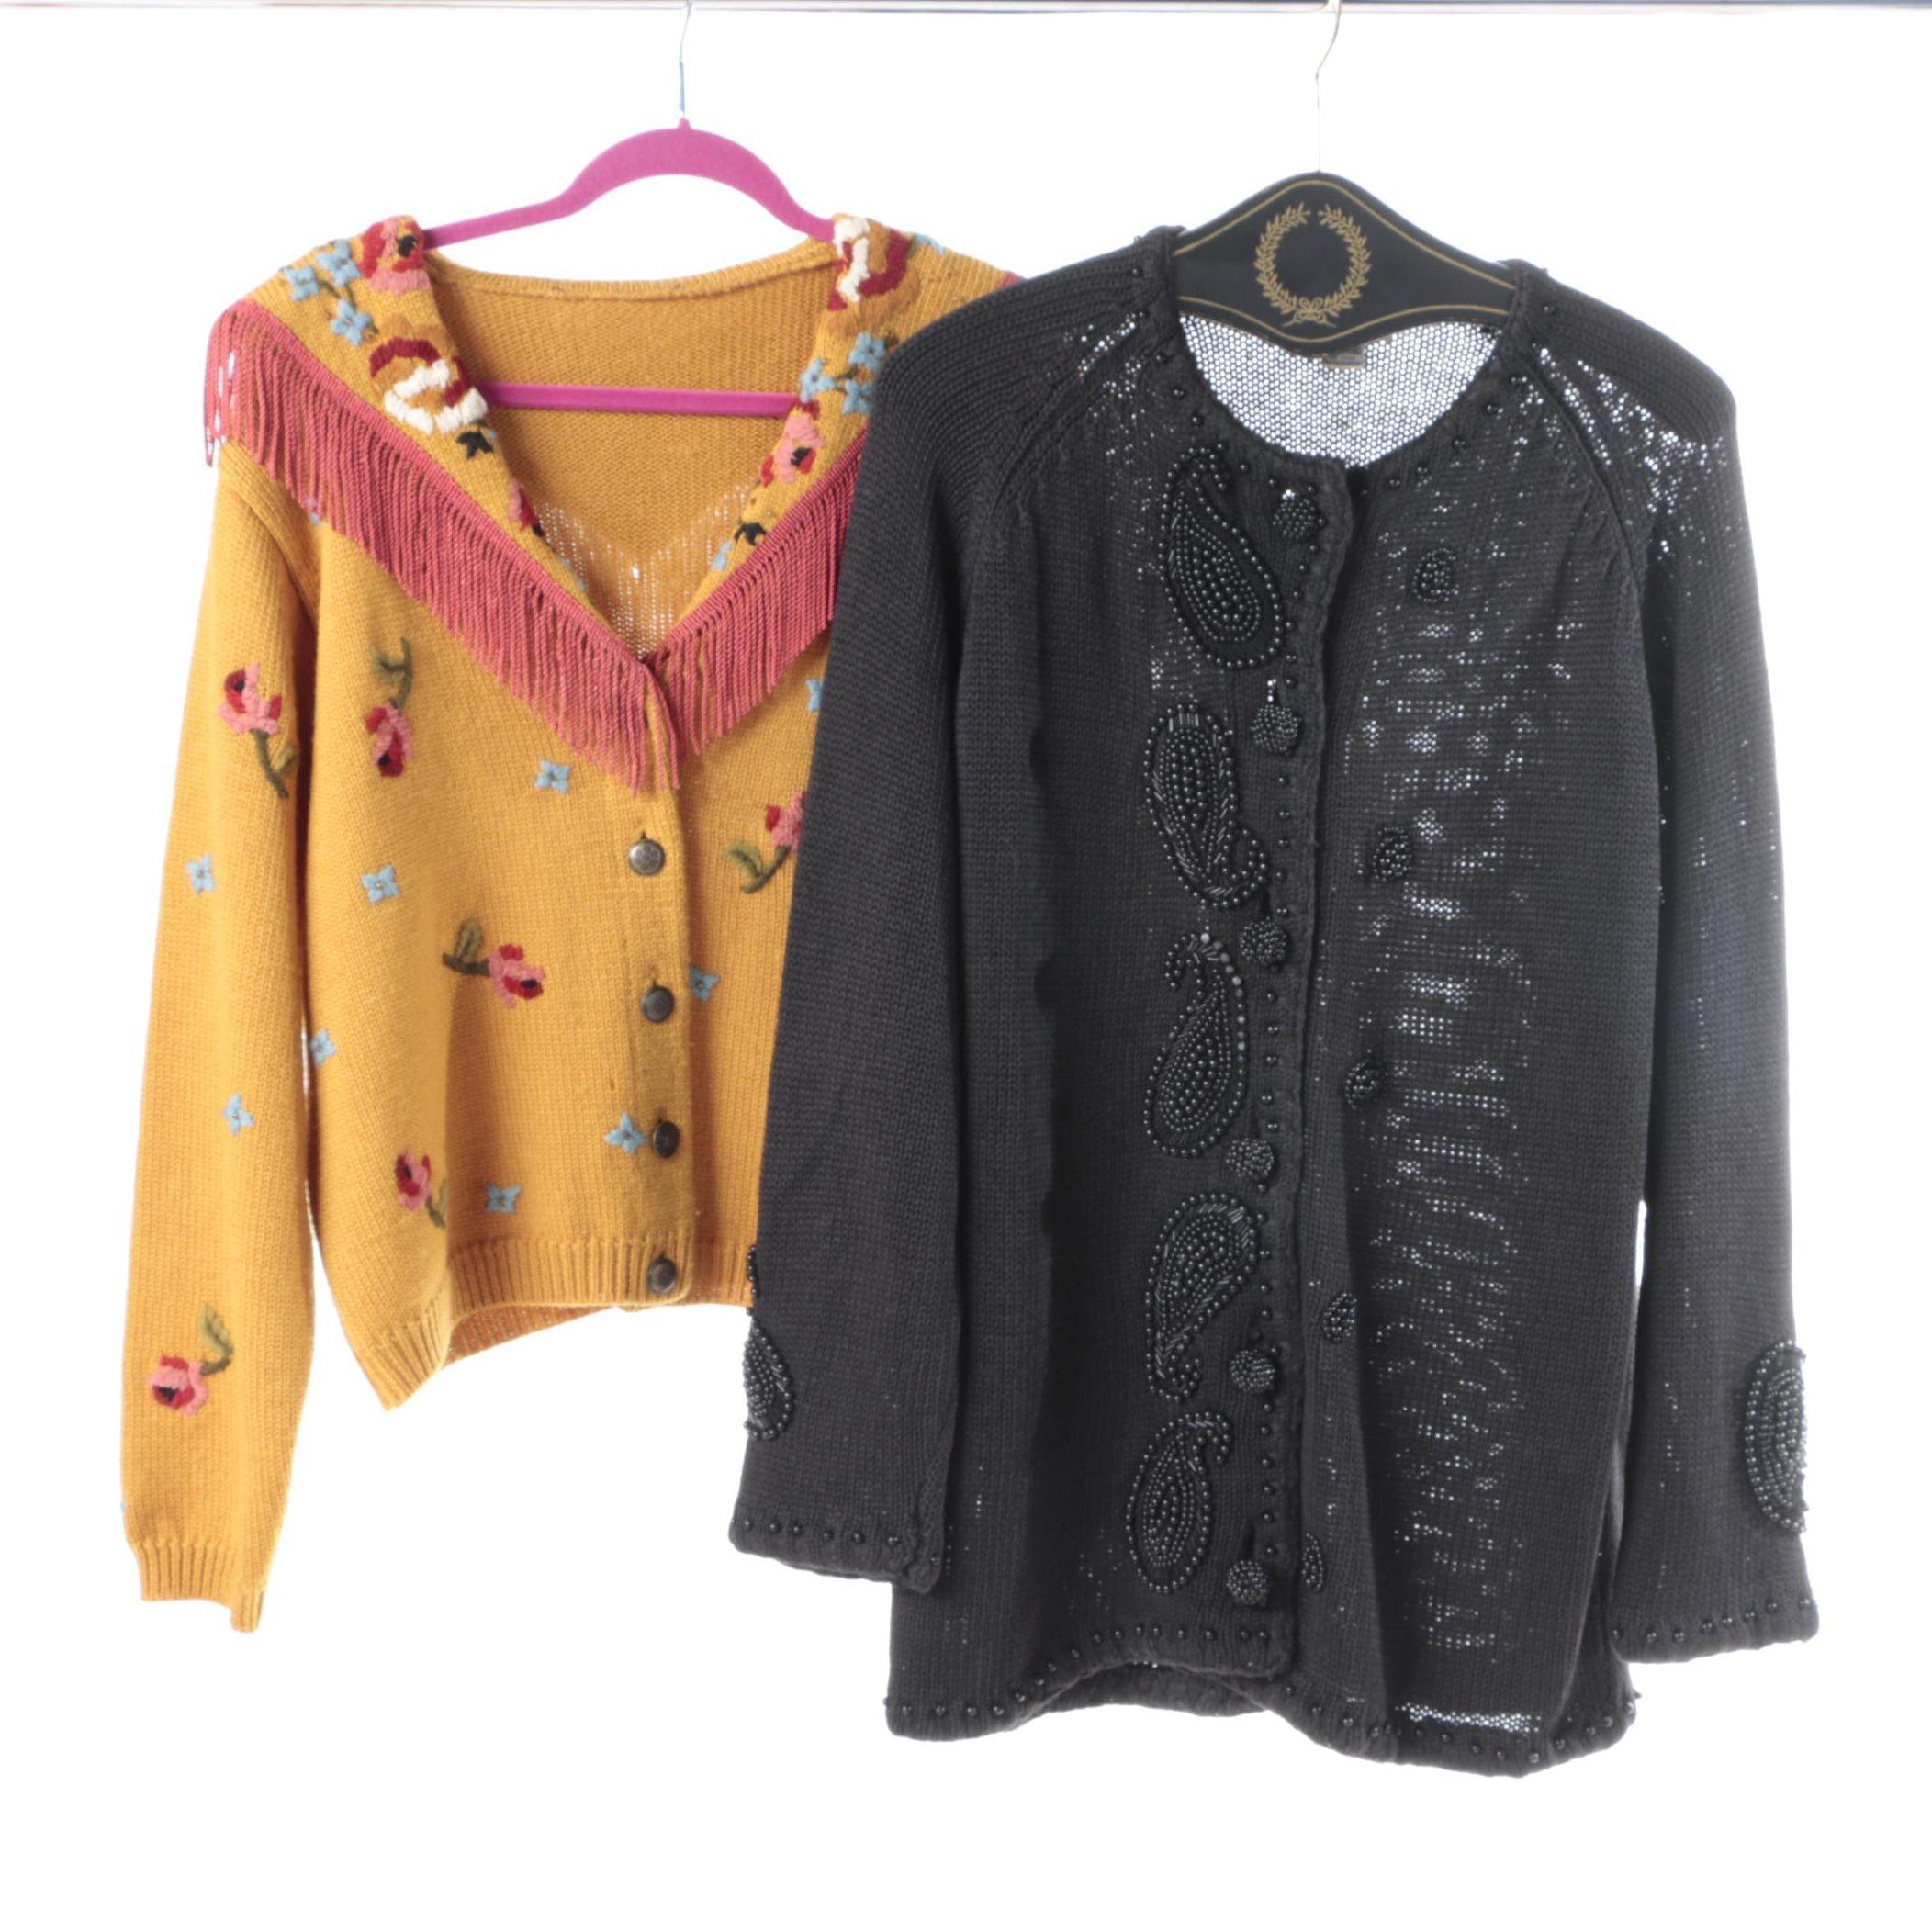 Pair of Vintage Embellished Cardigans